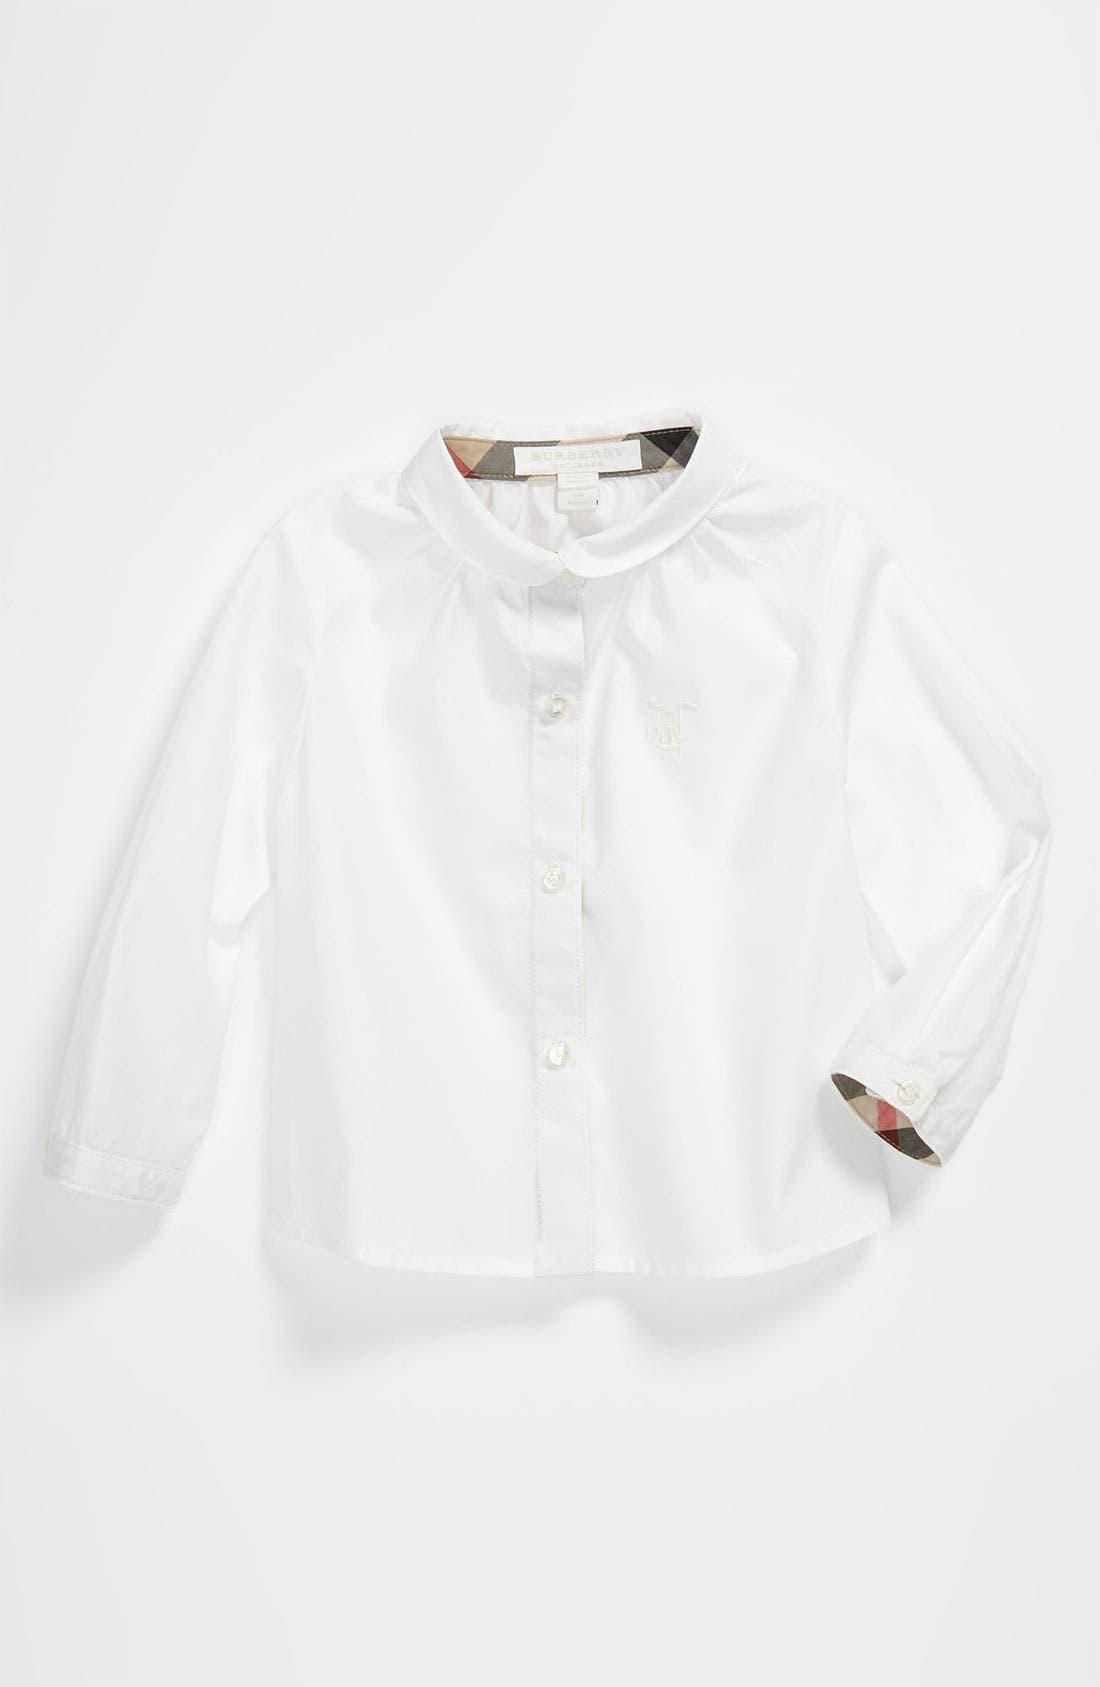 Alternate Image 1 Selected - Burberry Woven Shirt (Toddler)